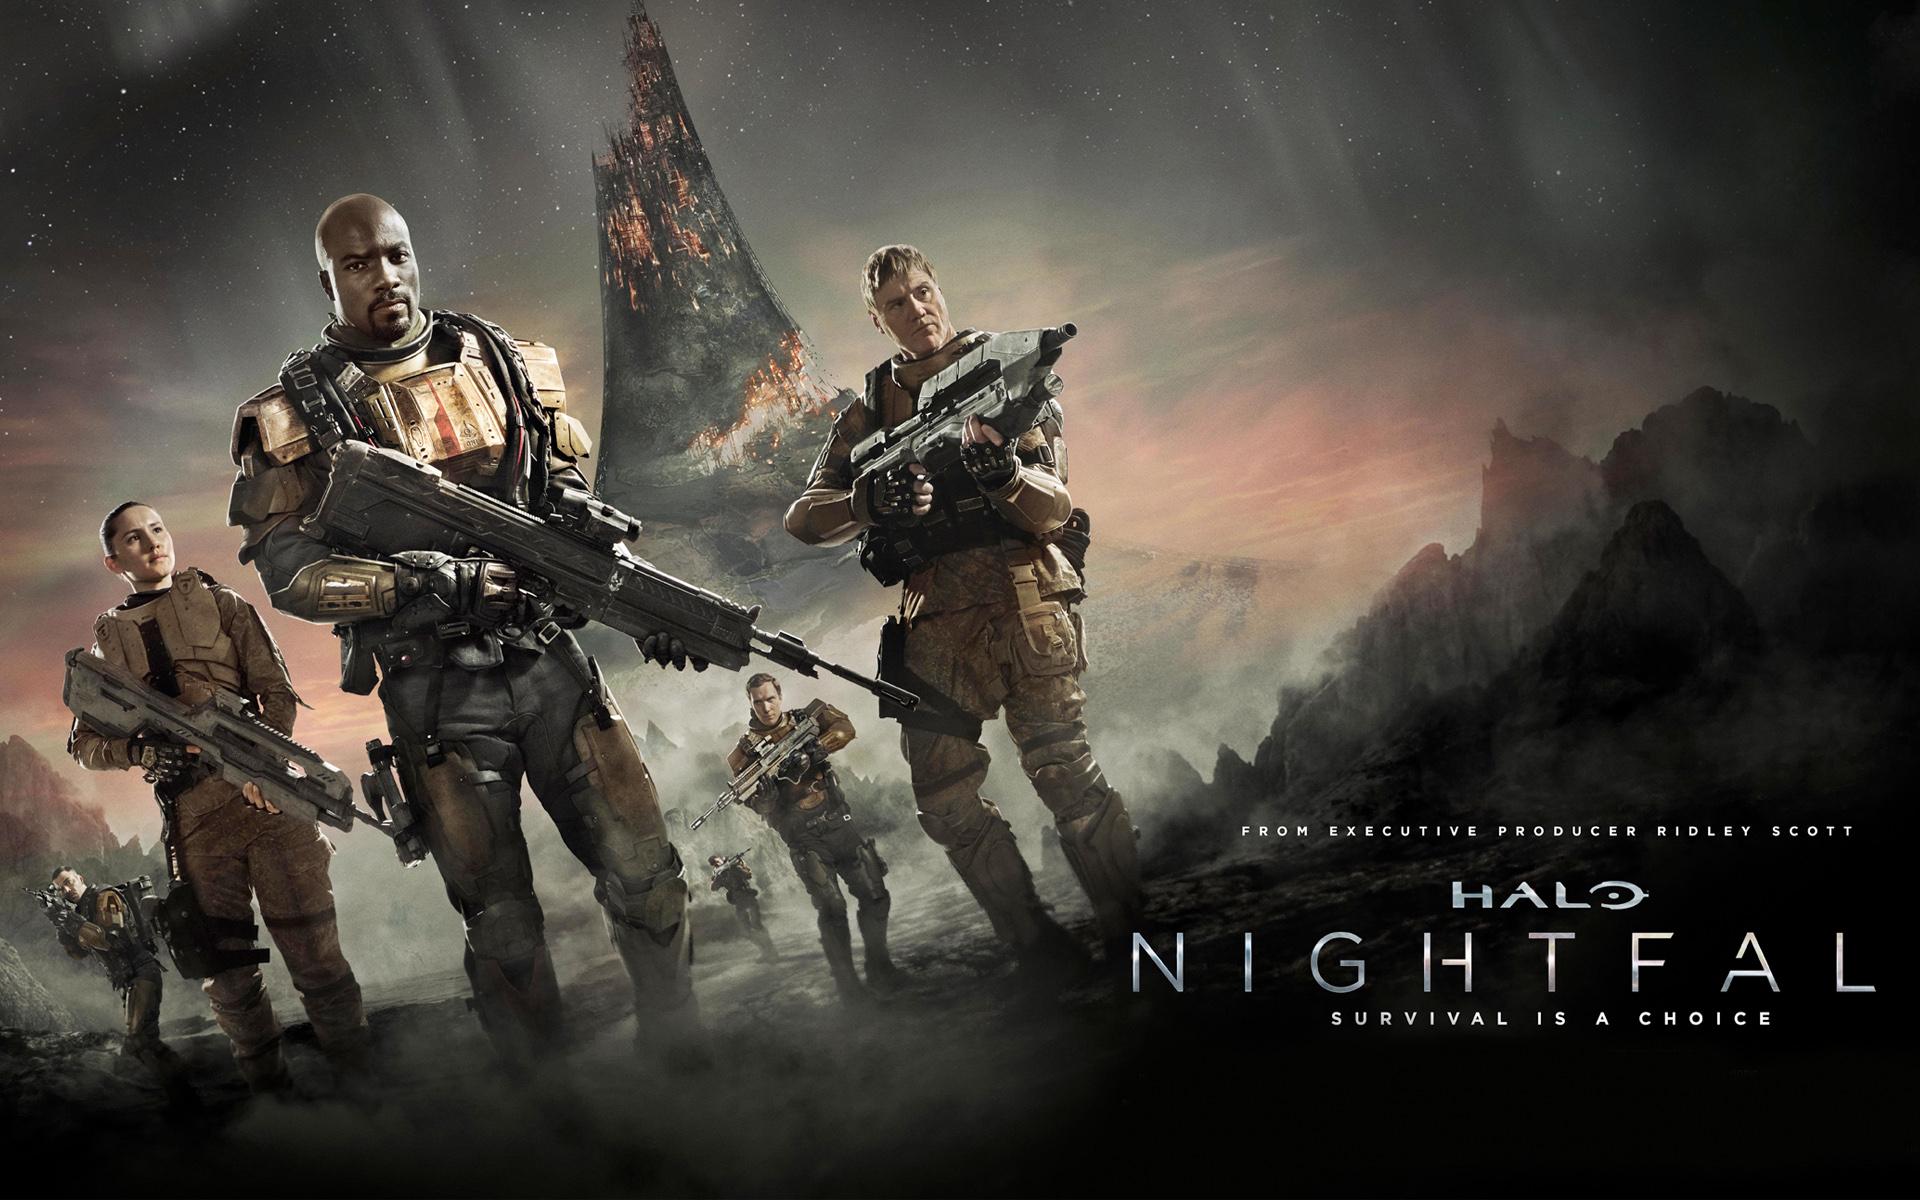 Halo Nightfall TV Series Wallpapers HD Wallpapers 1920x1200